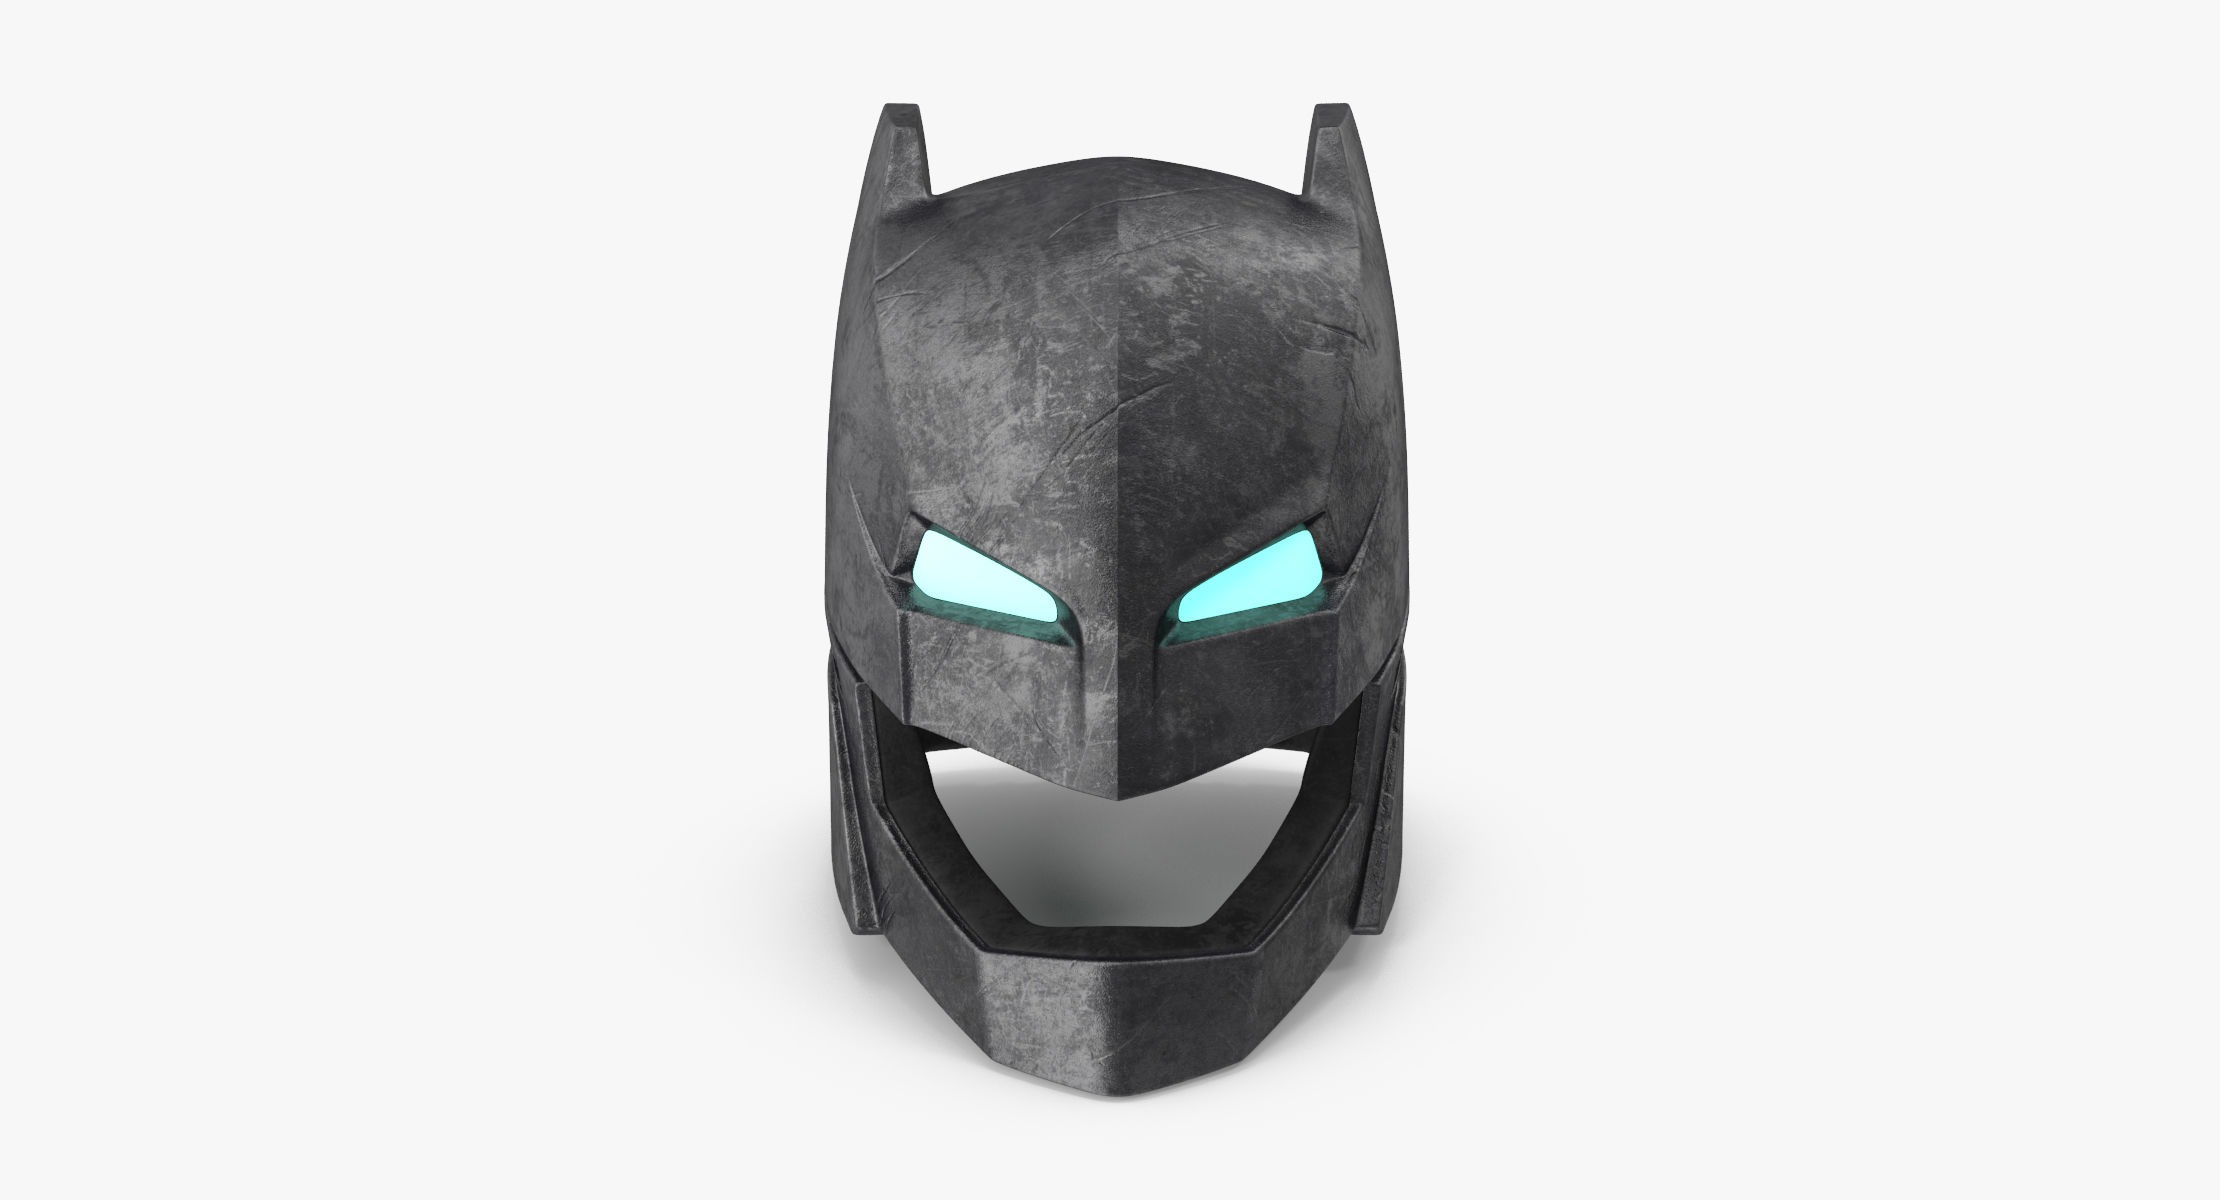 Batman Power Armor Helmet - reel 1